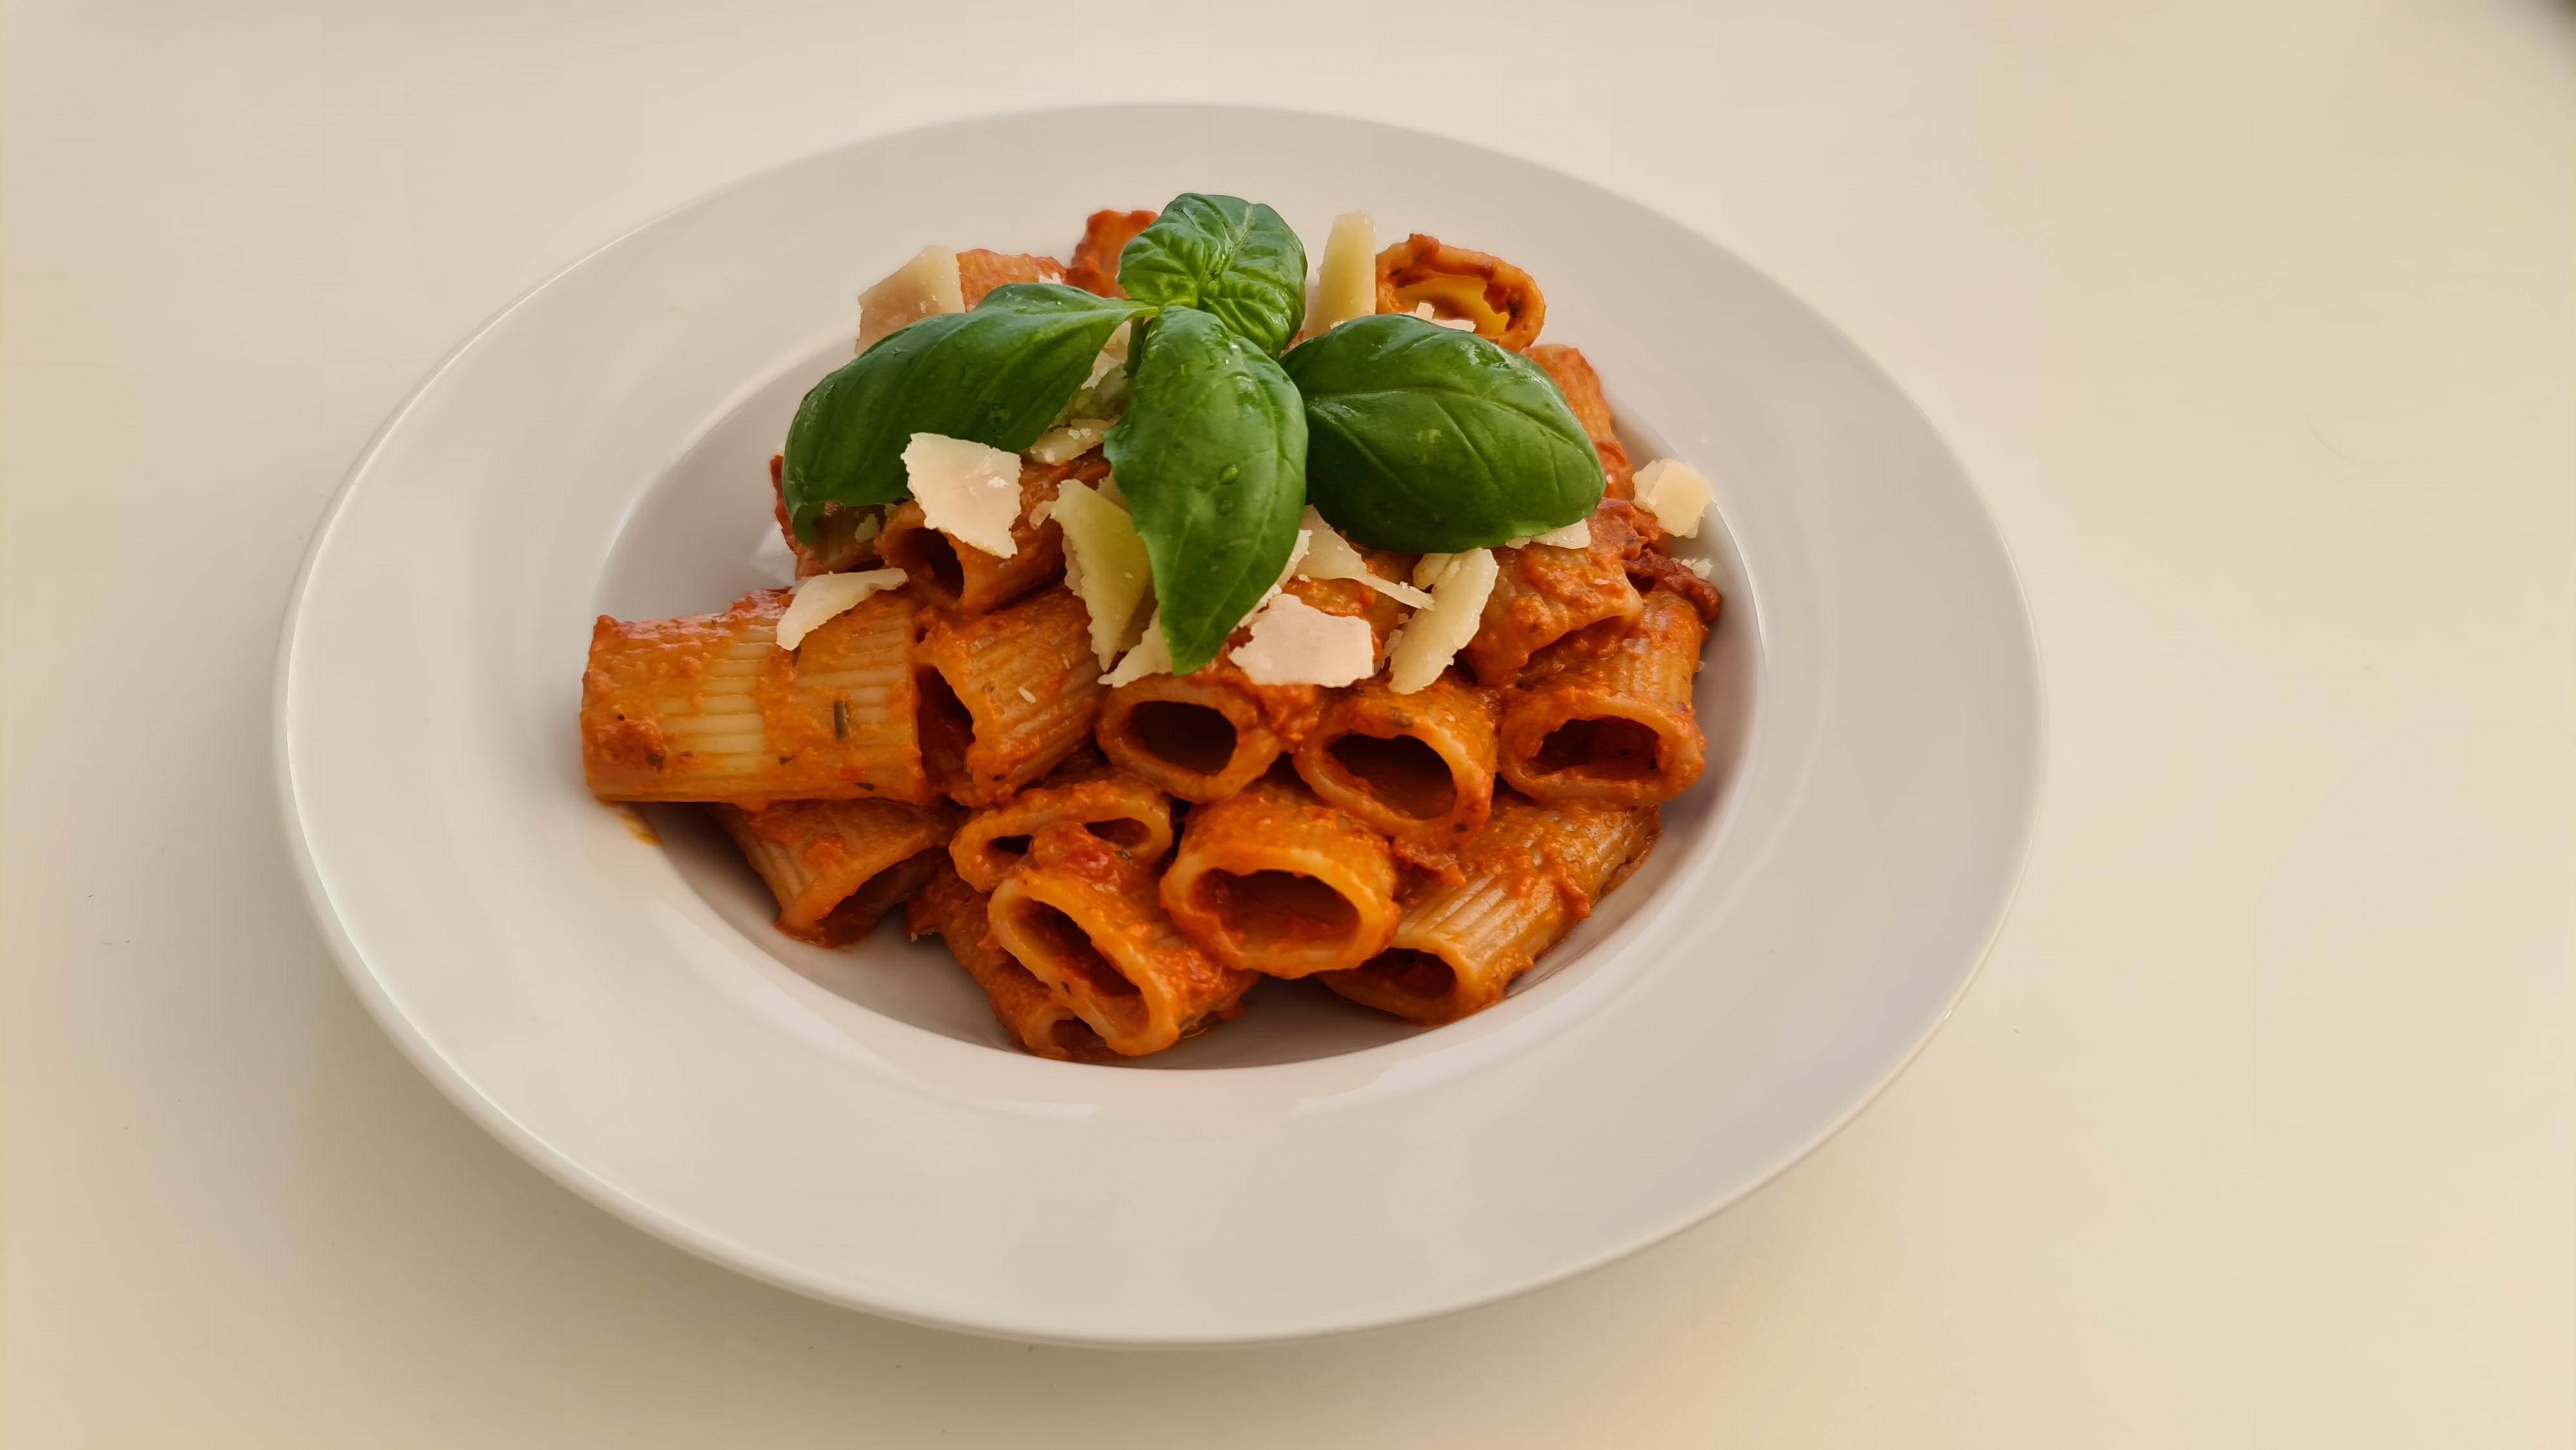 https://foodloader.net/Holz_2020-04-26_Rigatoni_con_Pomodori_Secchi.jpg